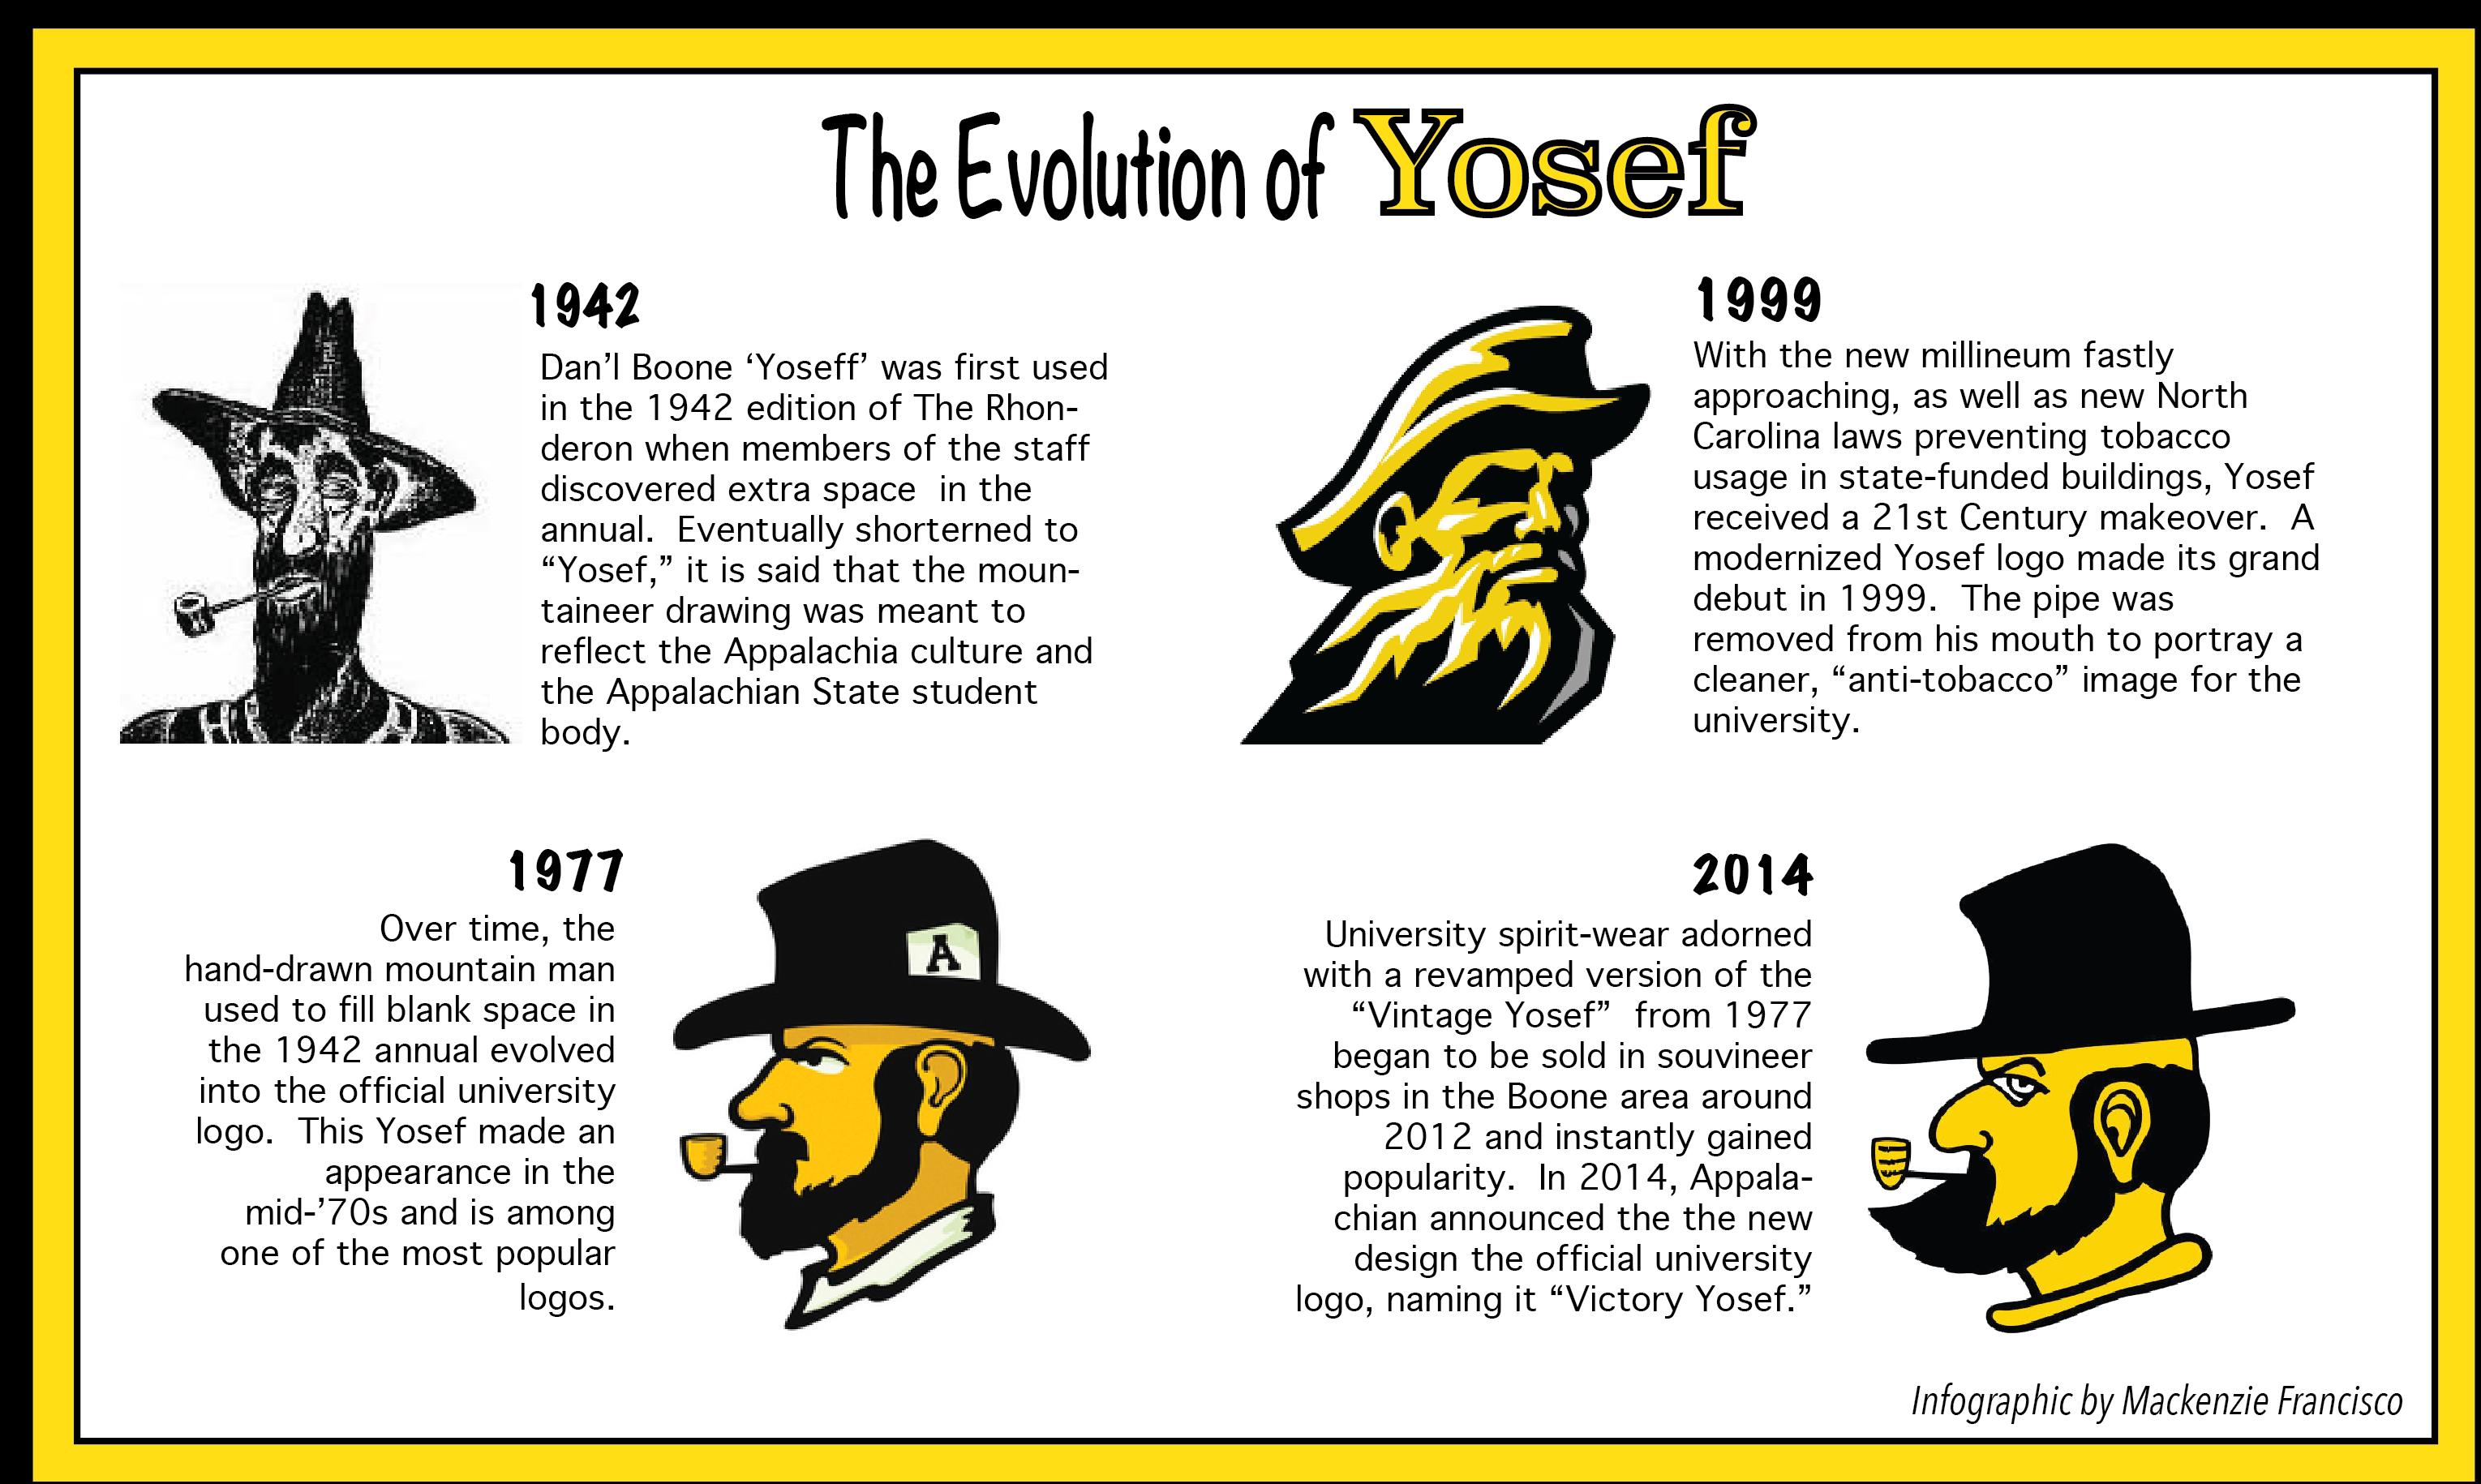 The Evolution of Yosef